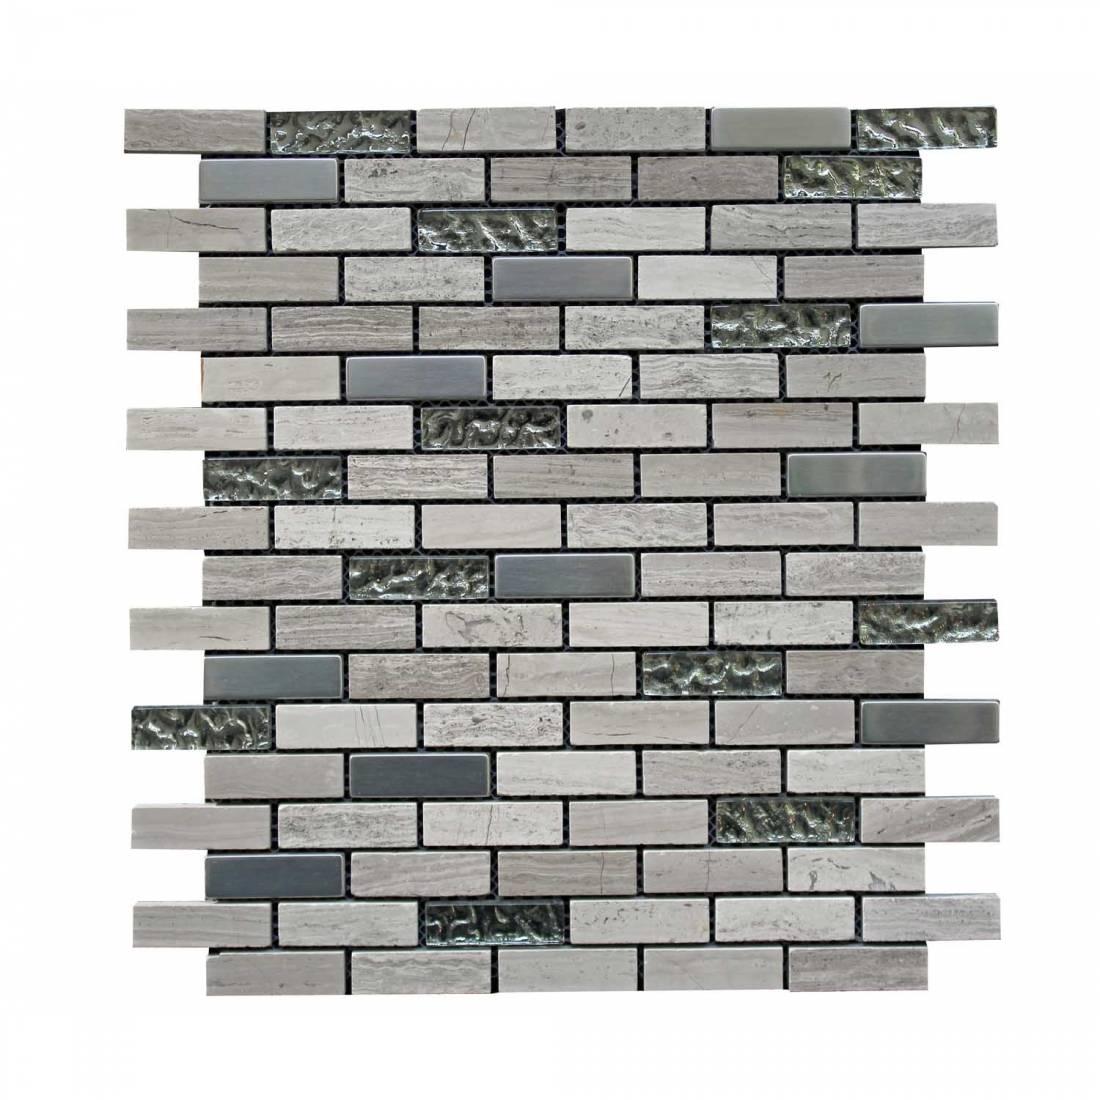 Greystone Brick 30x30 Grey 1